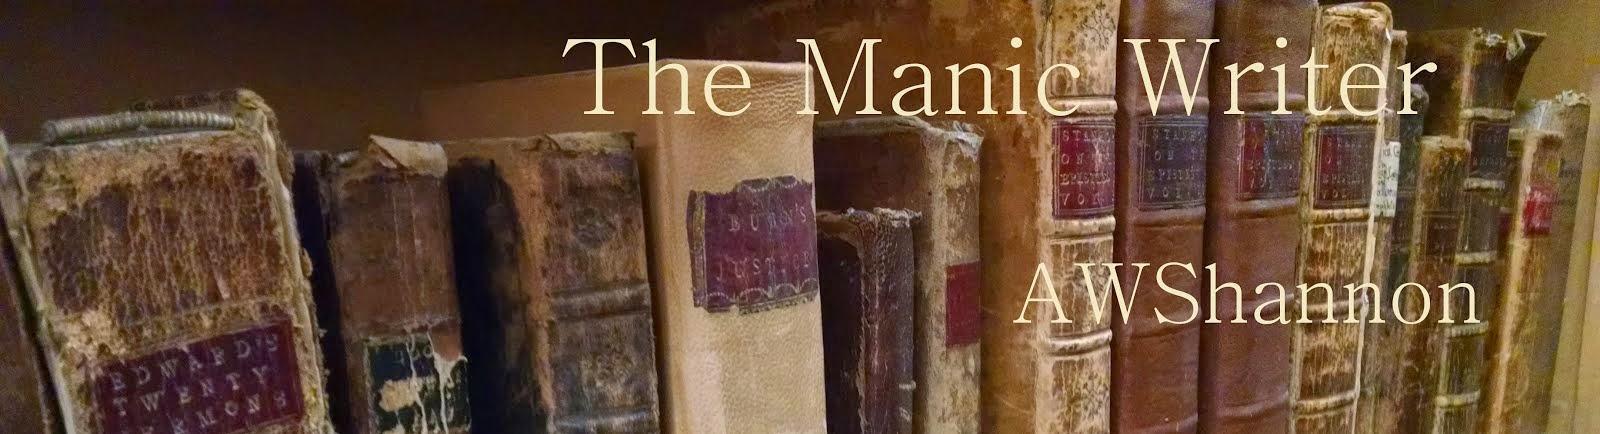 The Manic Writer